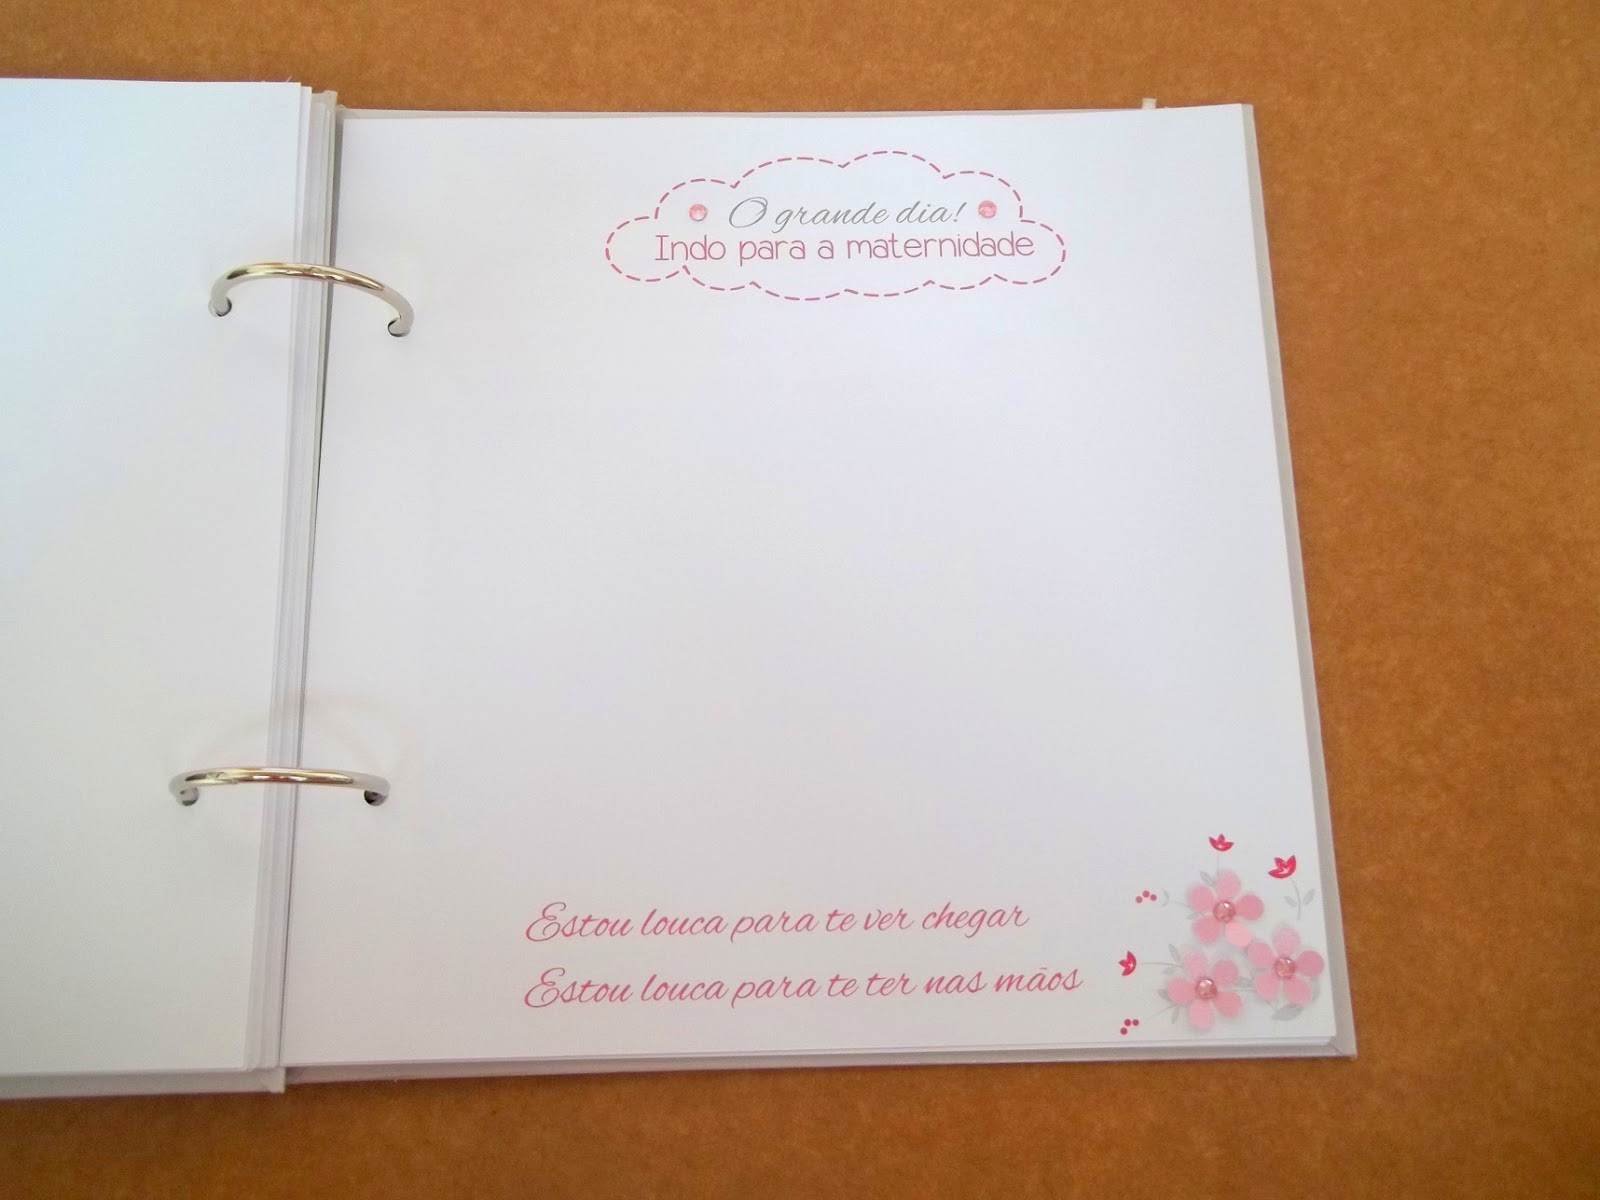 enxoval Sarah, diário gravidez, diário gestante, registro gravidez, scrapbook